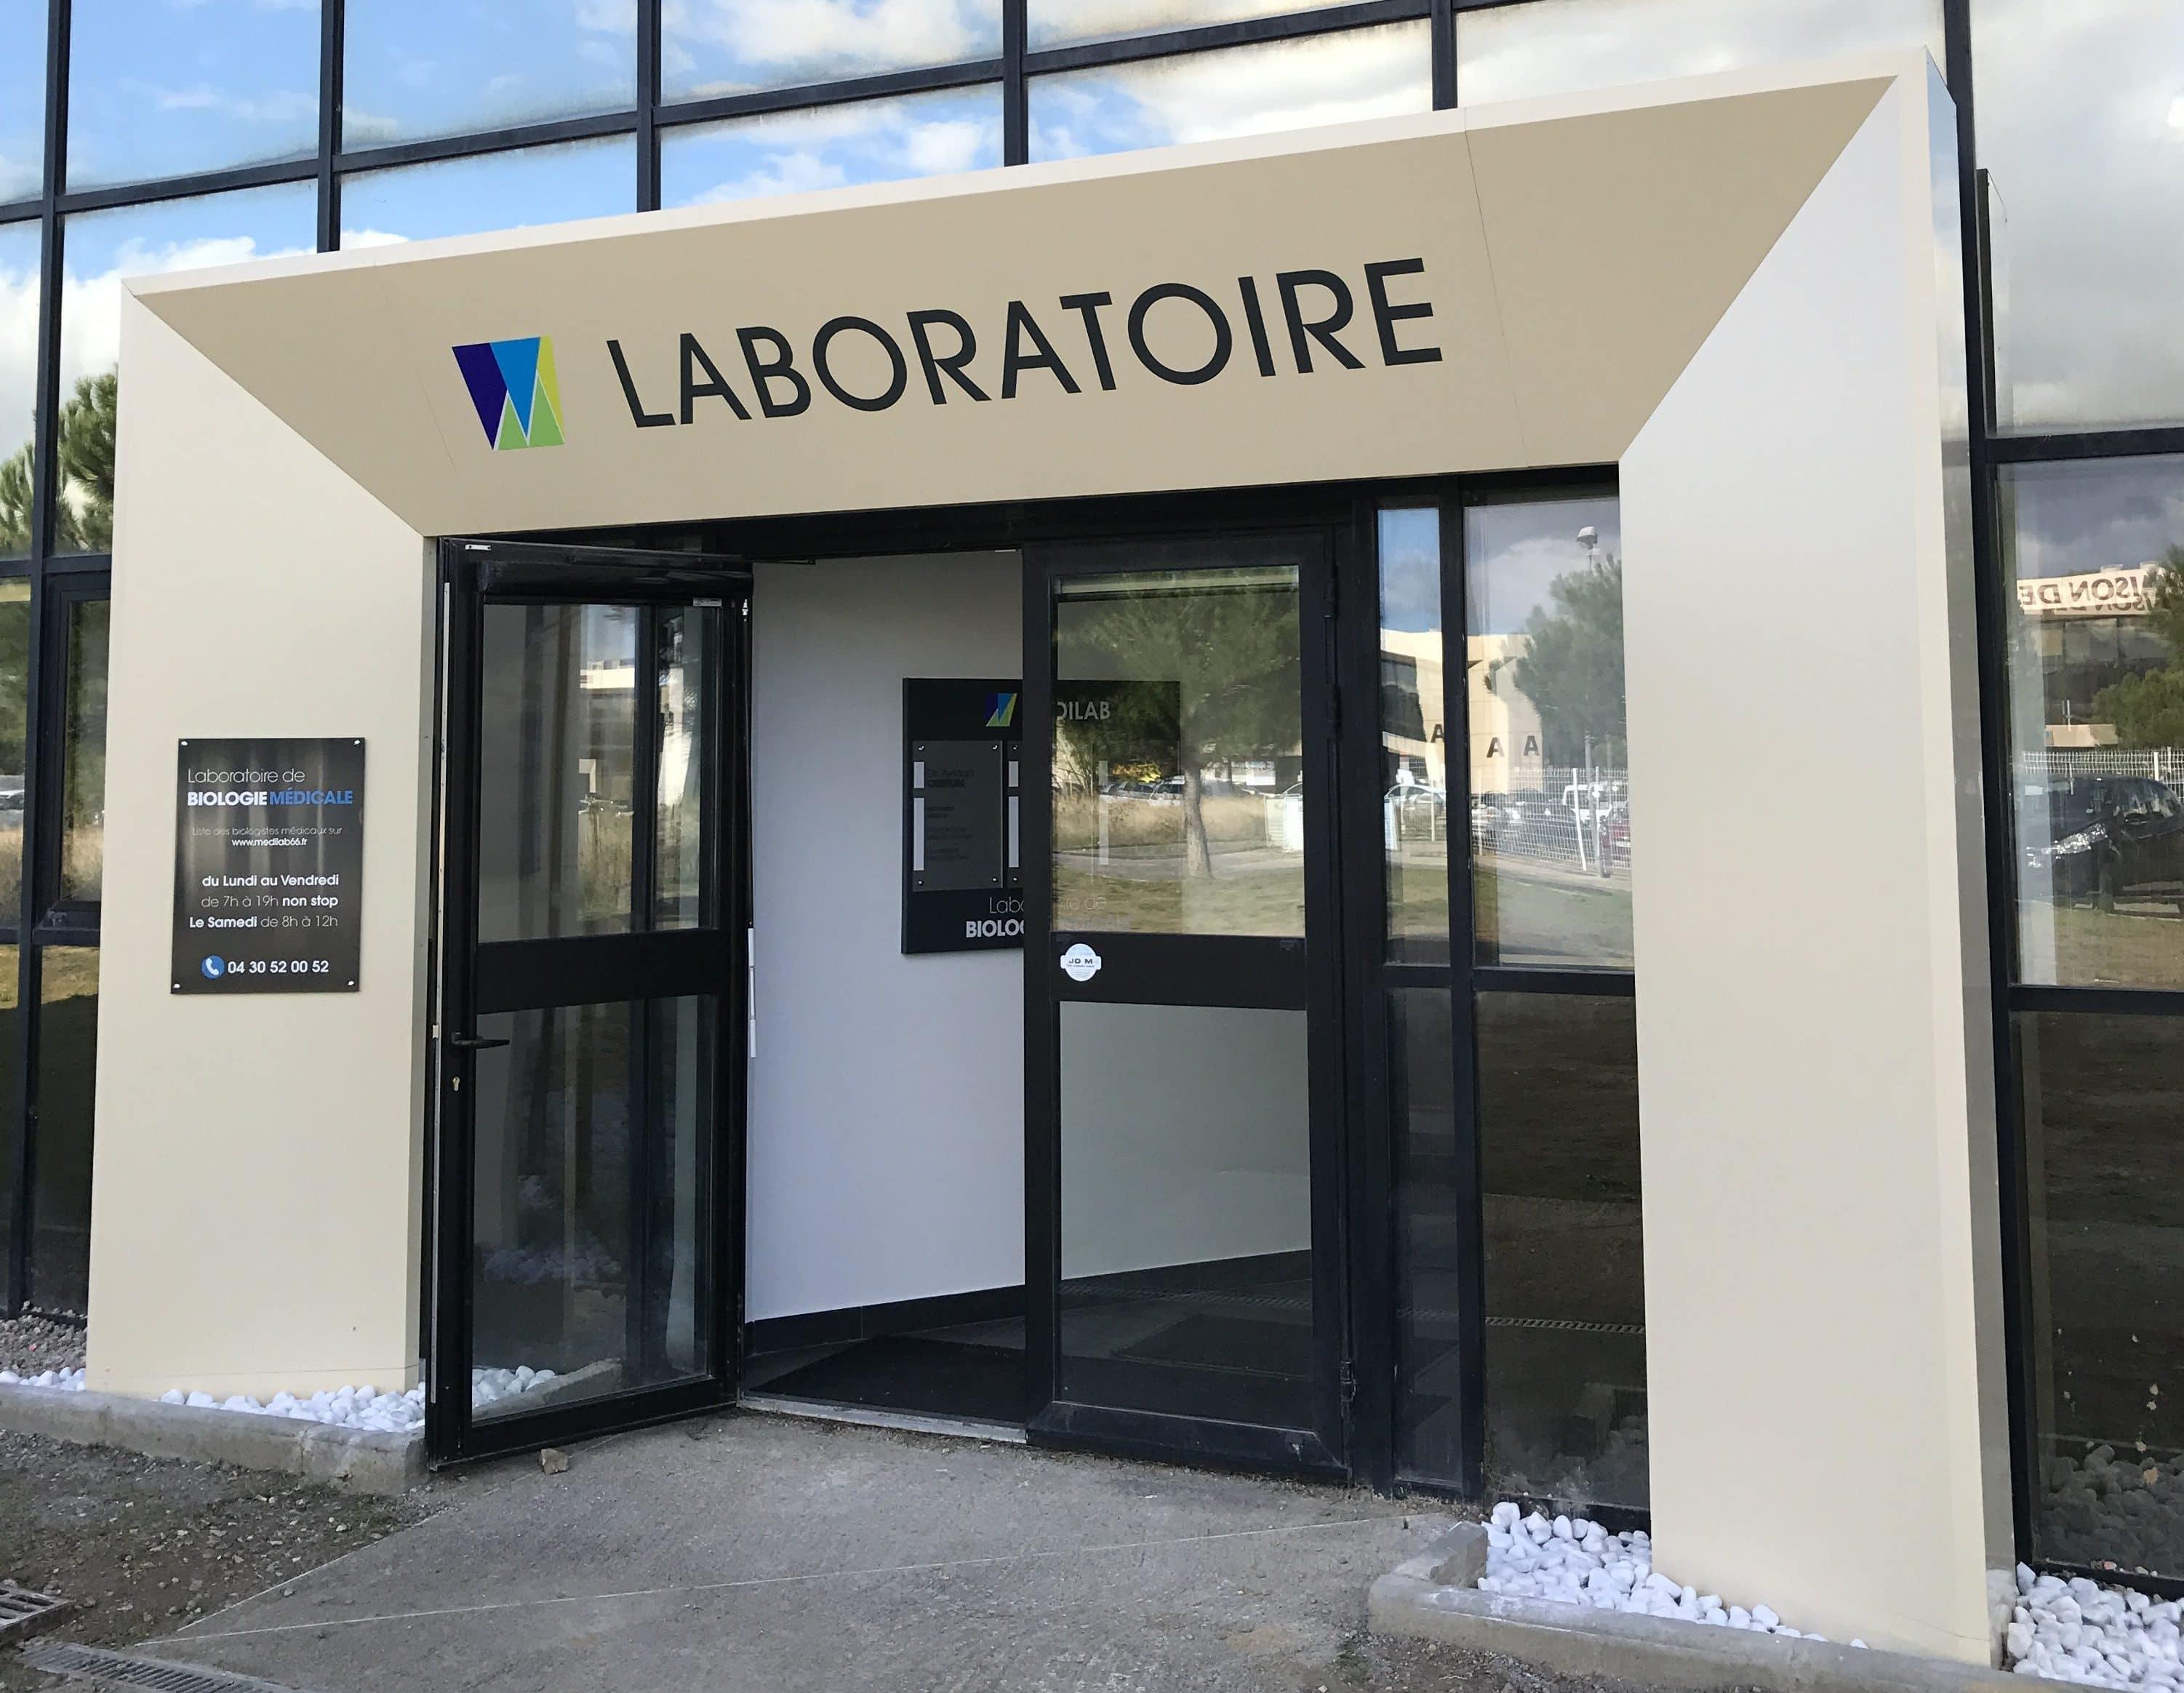 Laboratoire Medicale Narbonne Entree Prise Sang